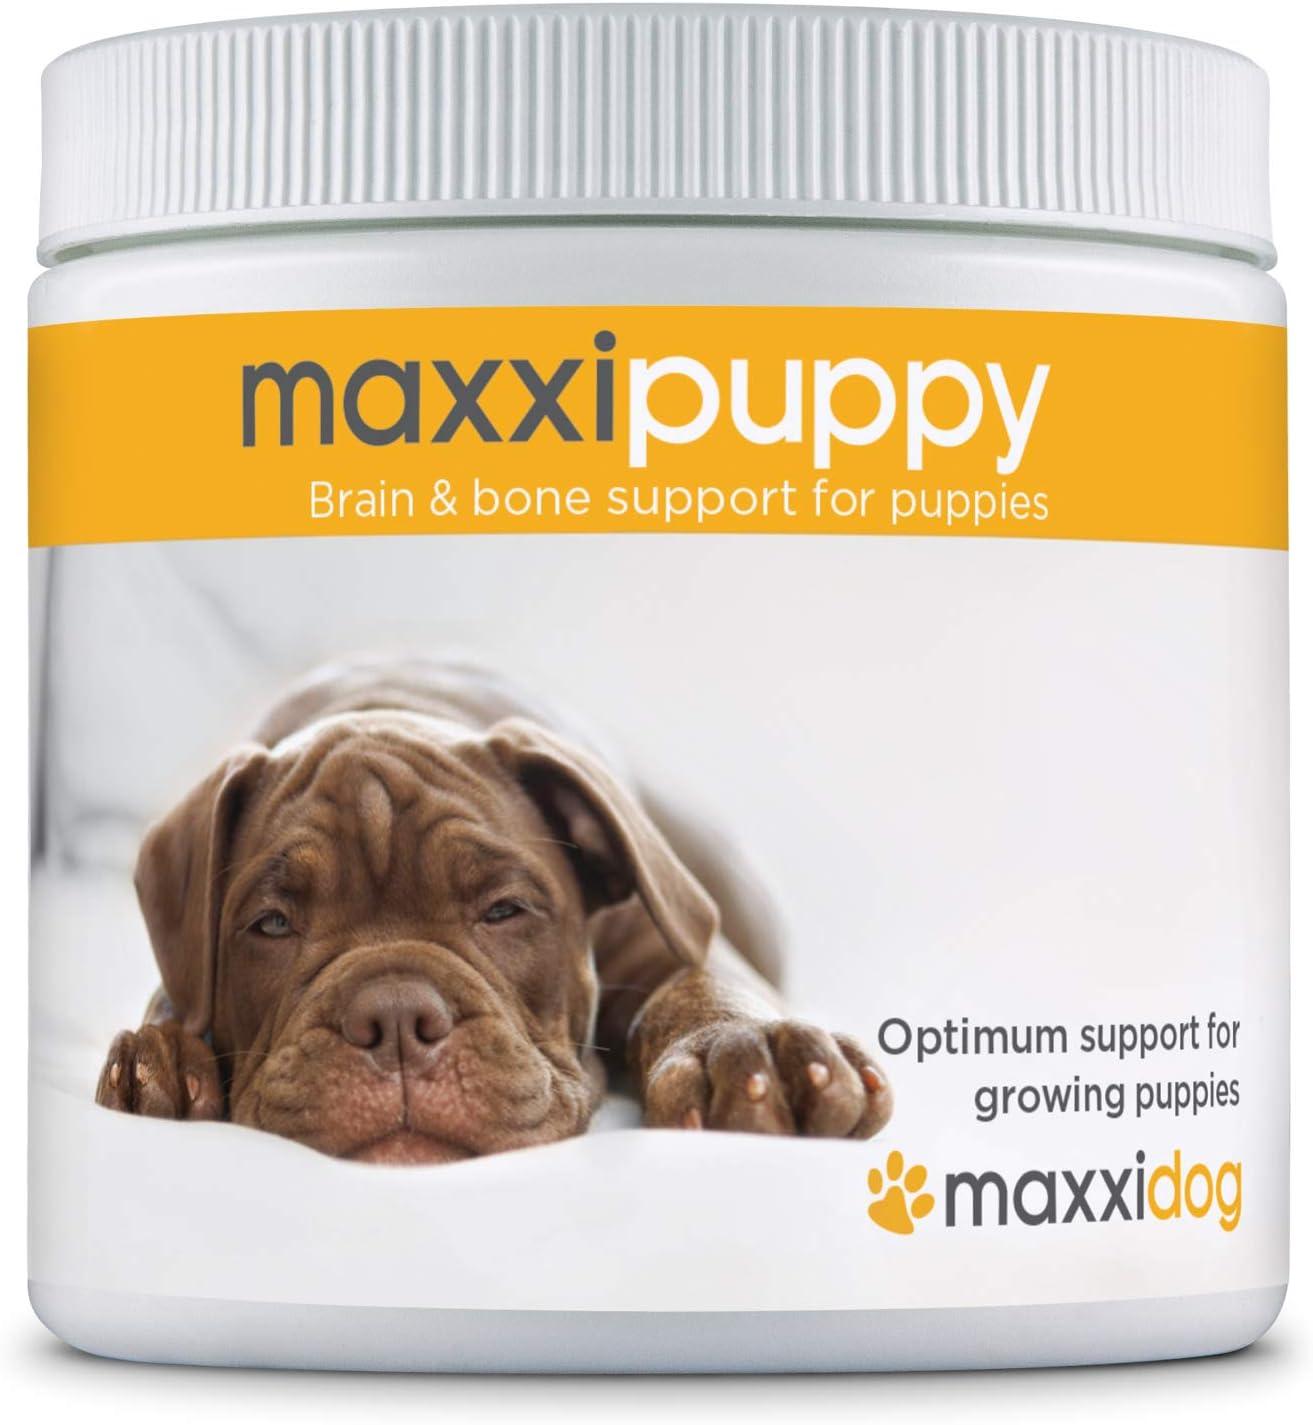 maxxipuppy